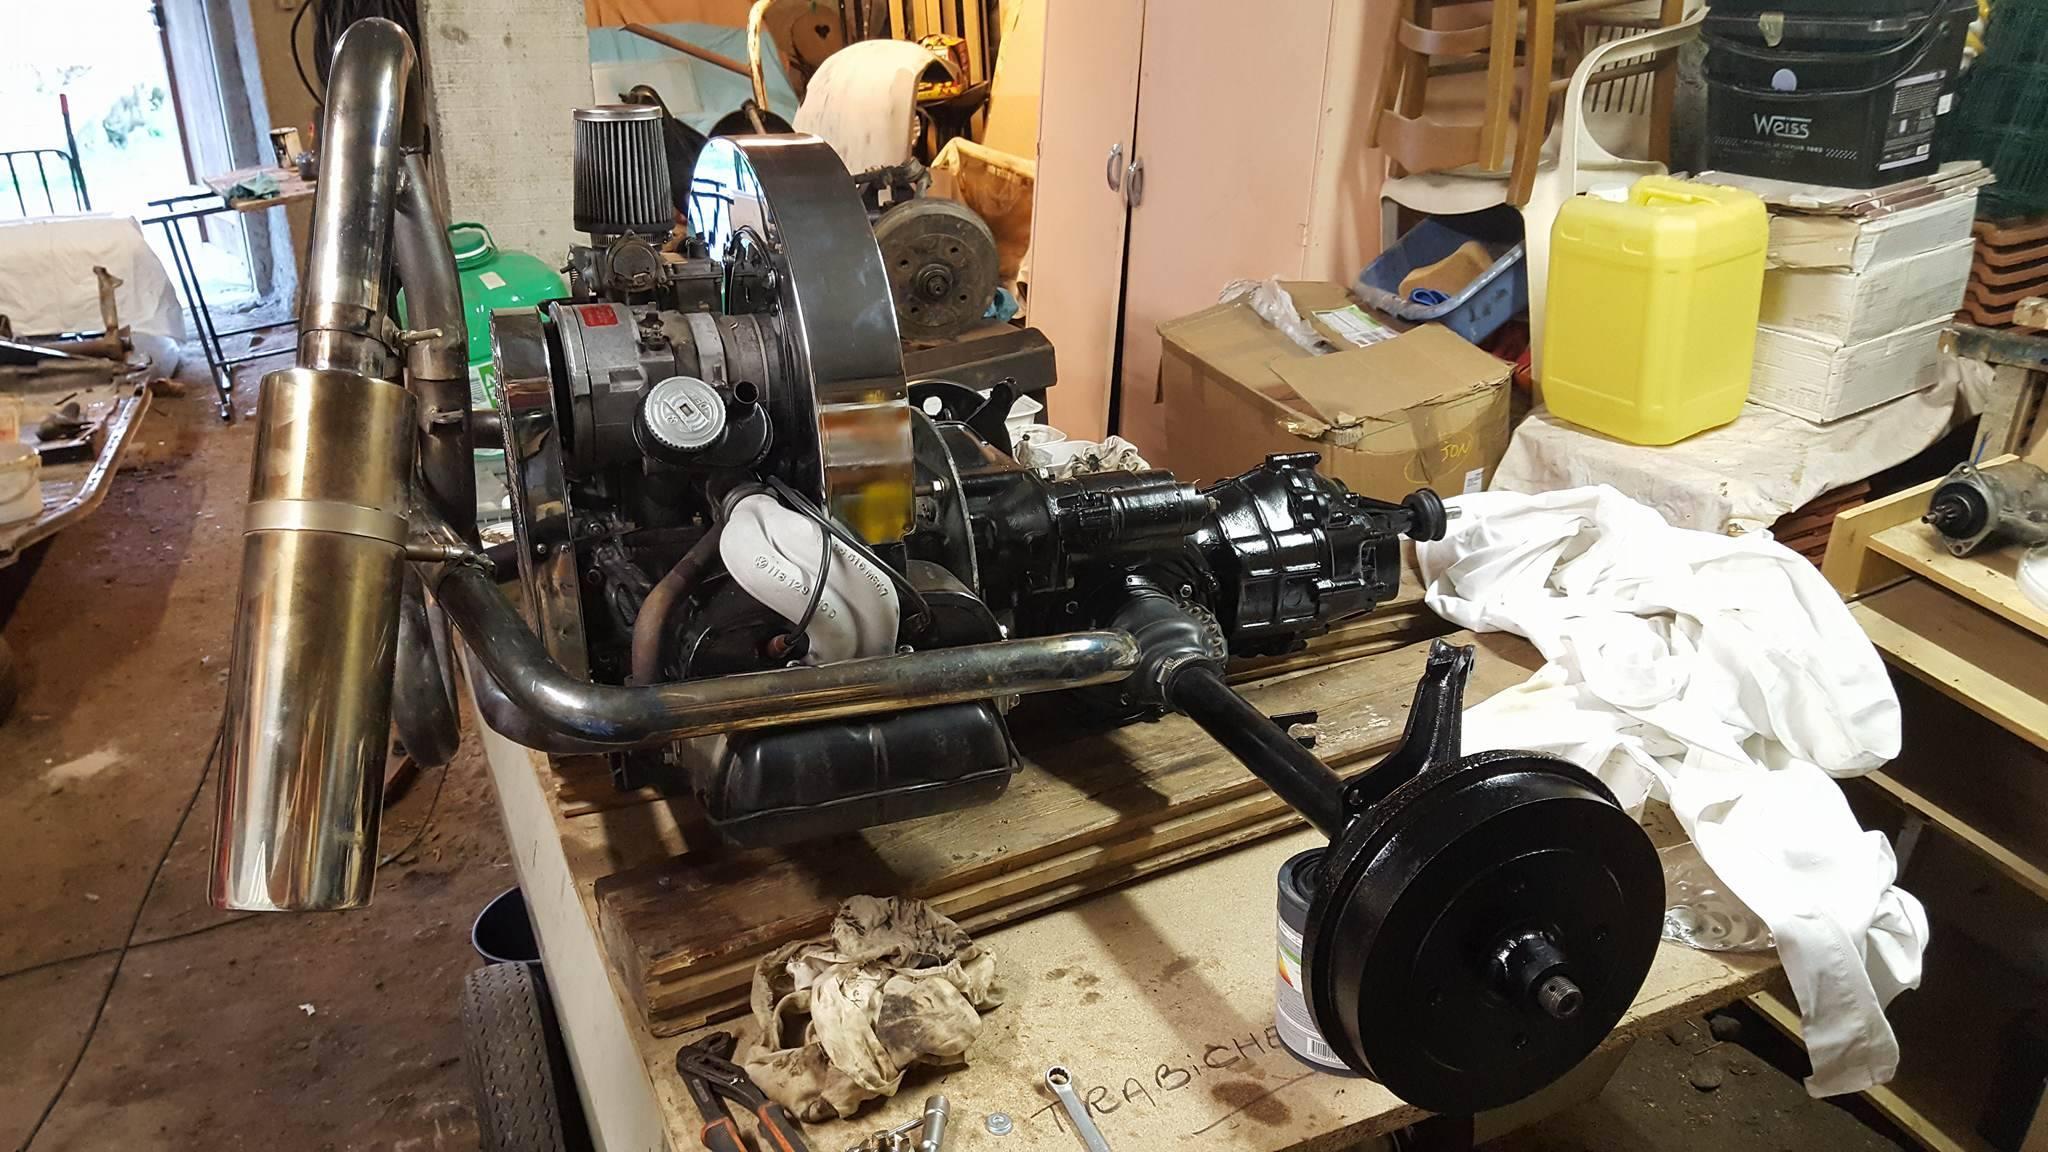 projet remontage buggy super GP 74  71095117886796101547233473491391173805734o